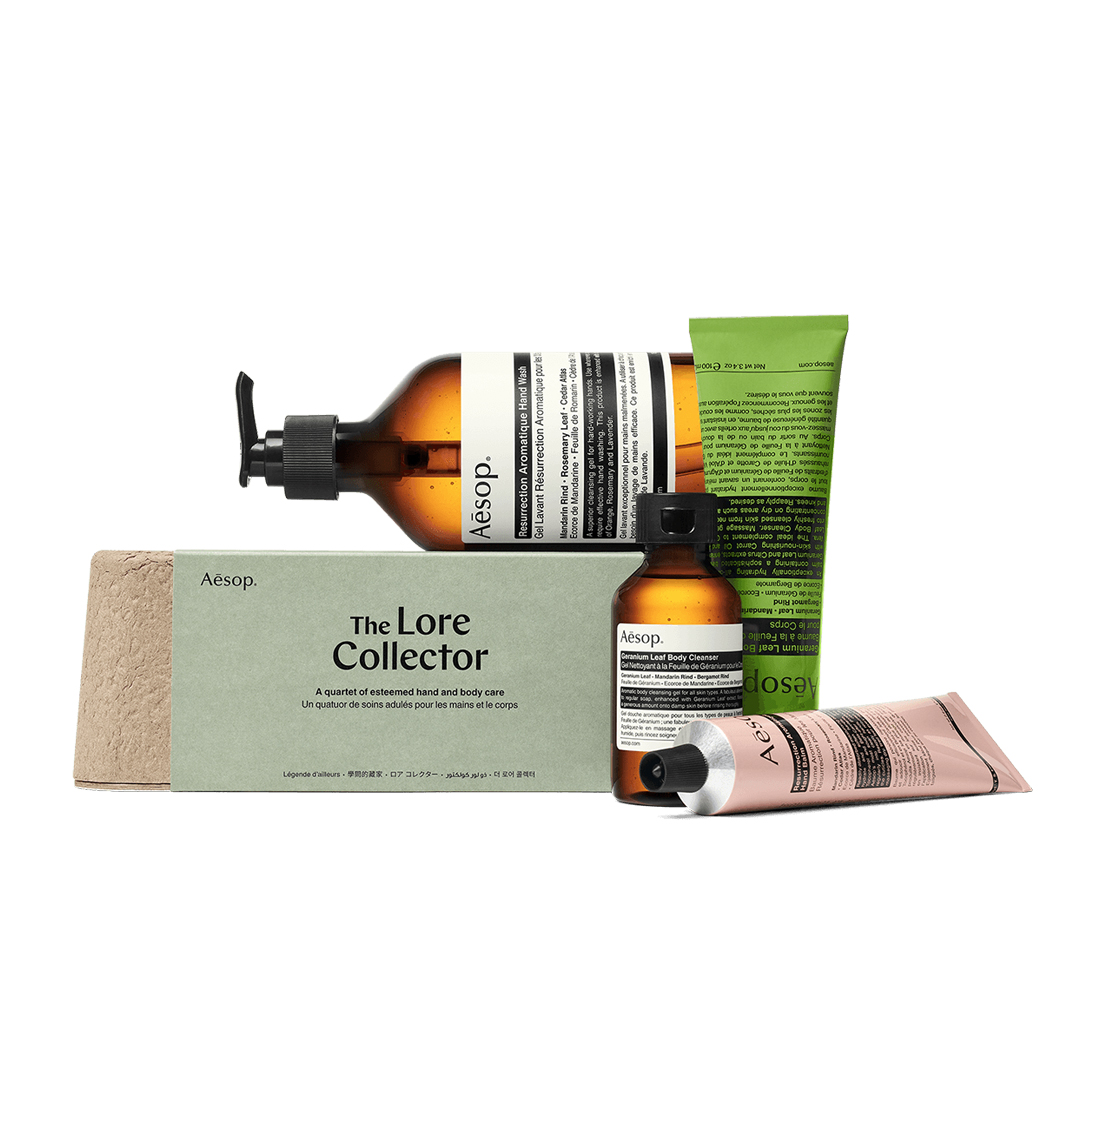 Aesop_Kits_Gift_Kits_2020-21_The_Lore_Collector_Hybris_Medium_1238x752px